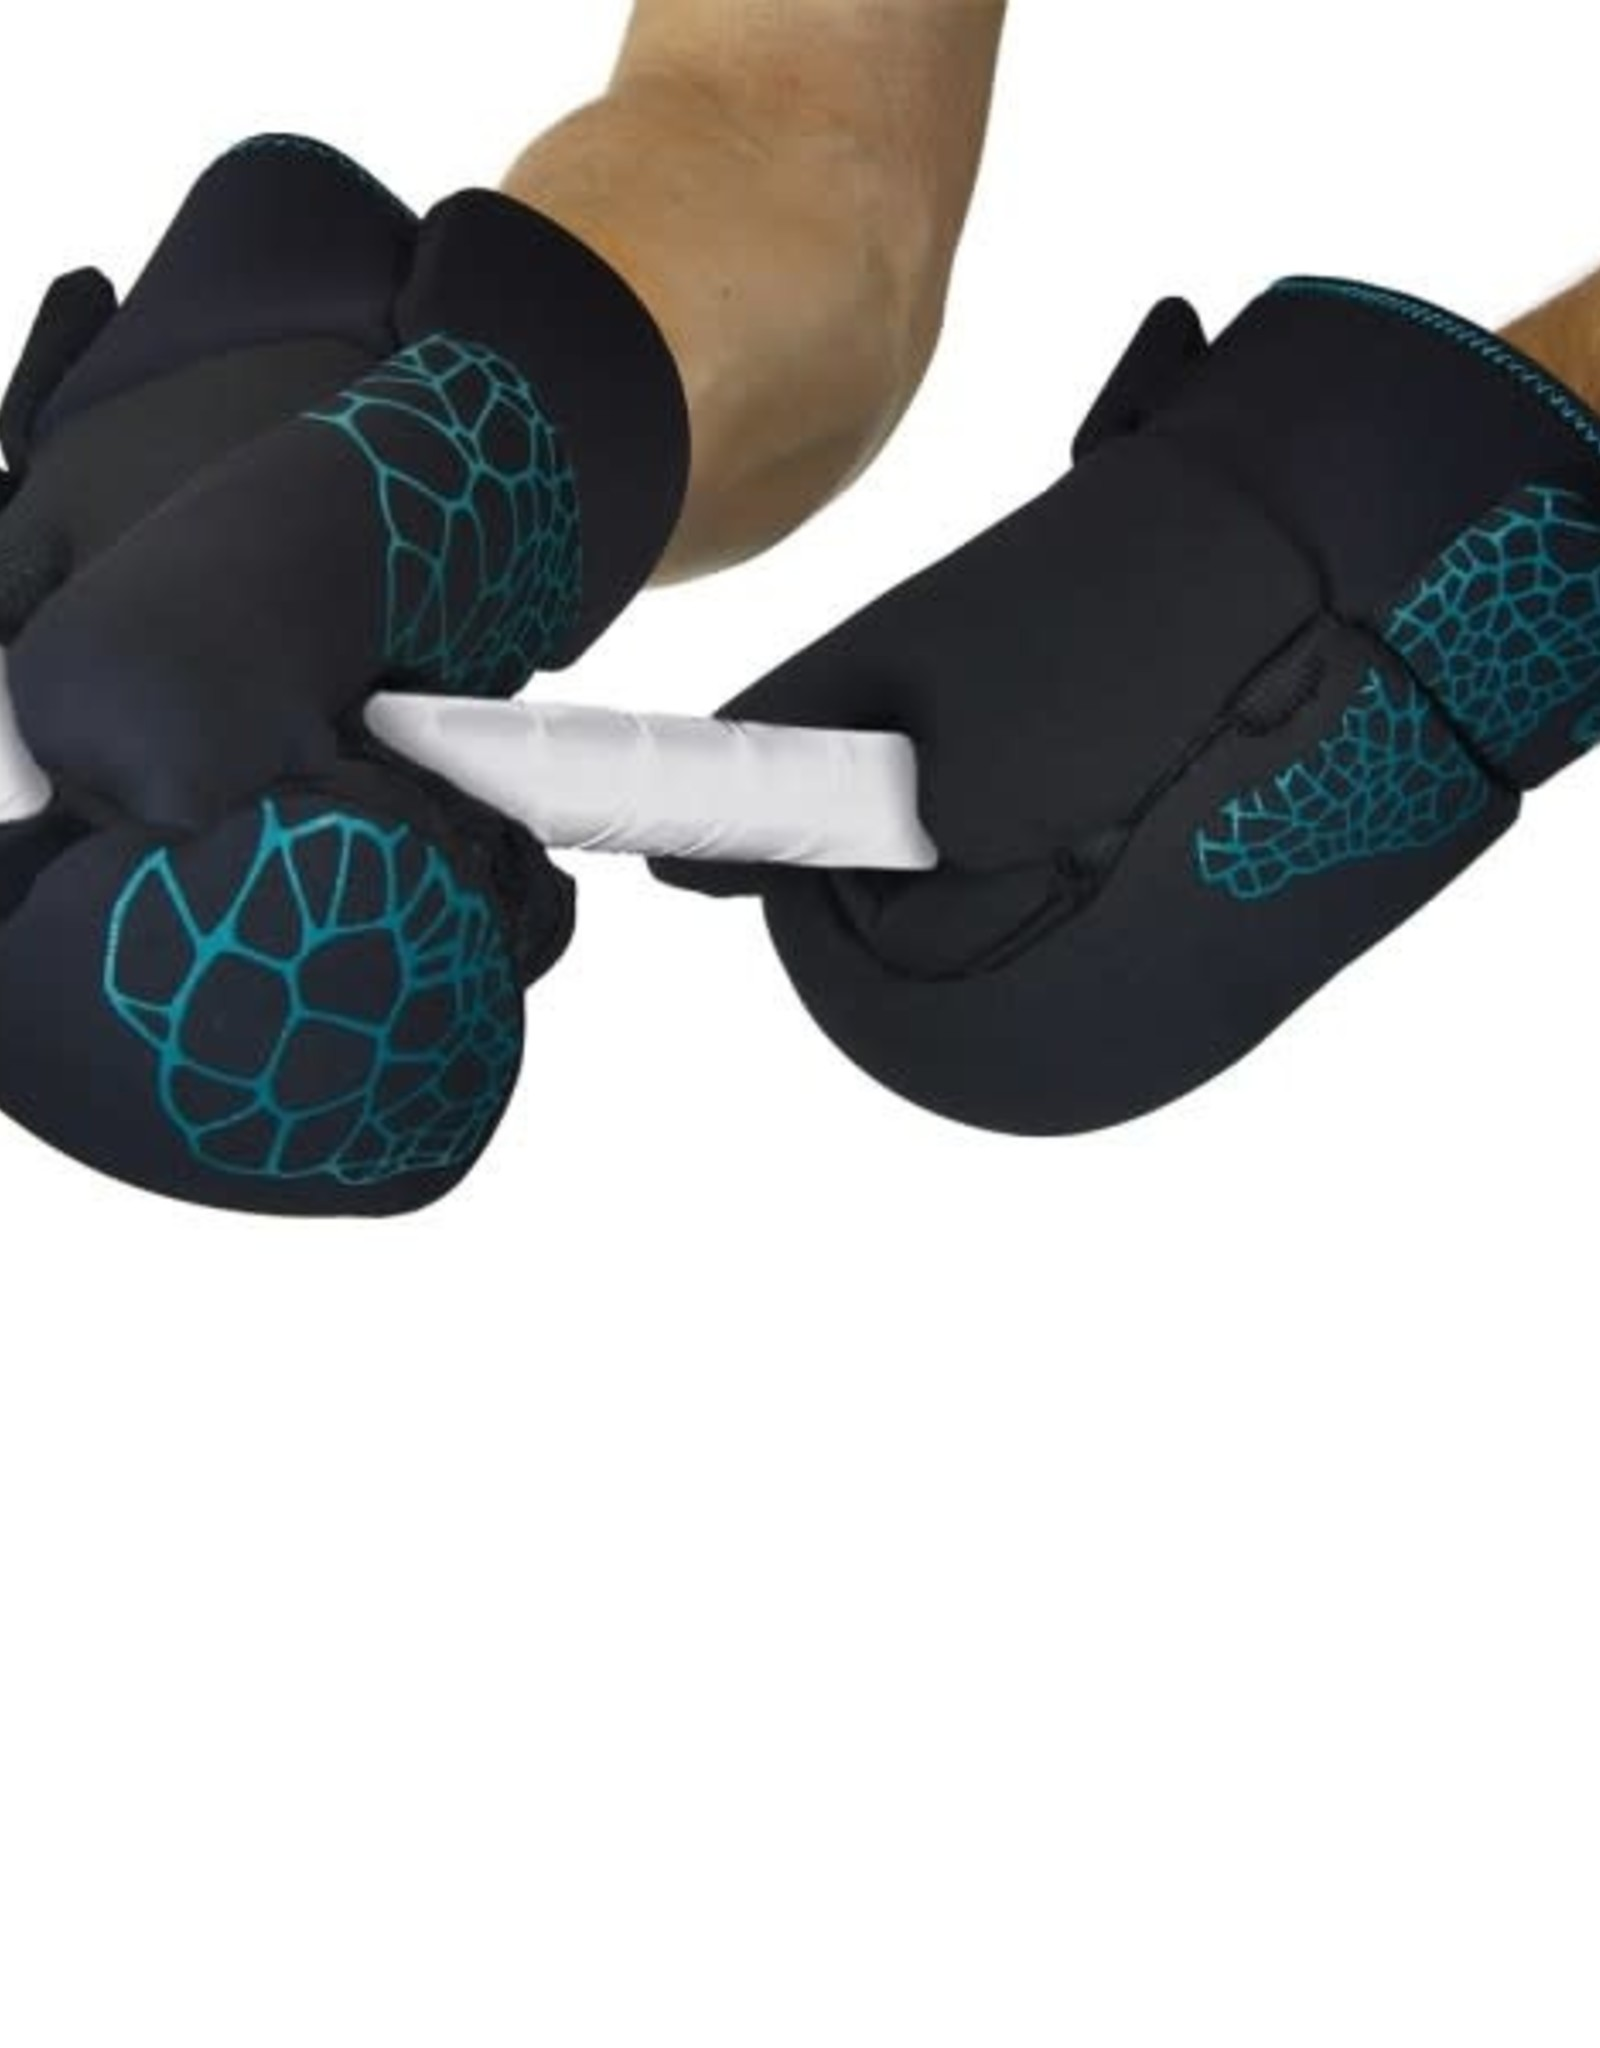 OBO OOP/Obo PC Handprotectors one size